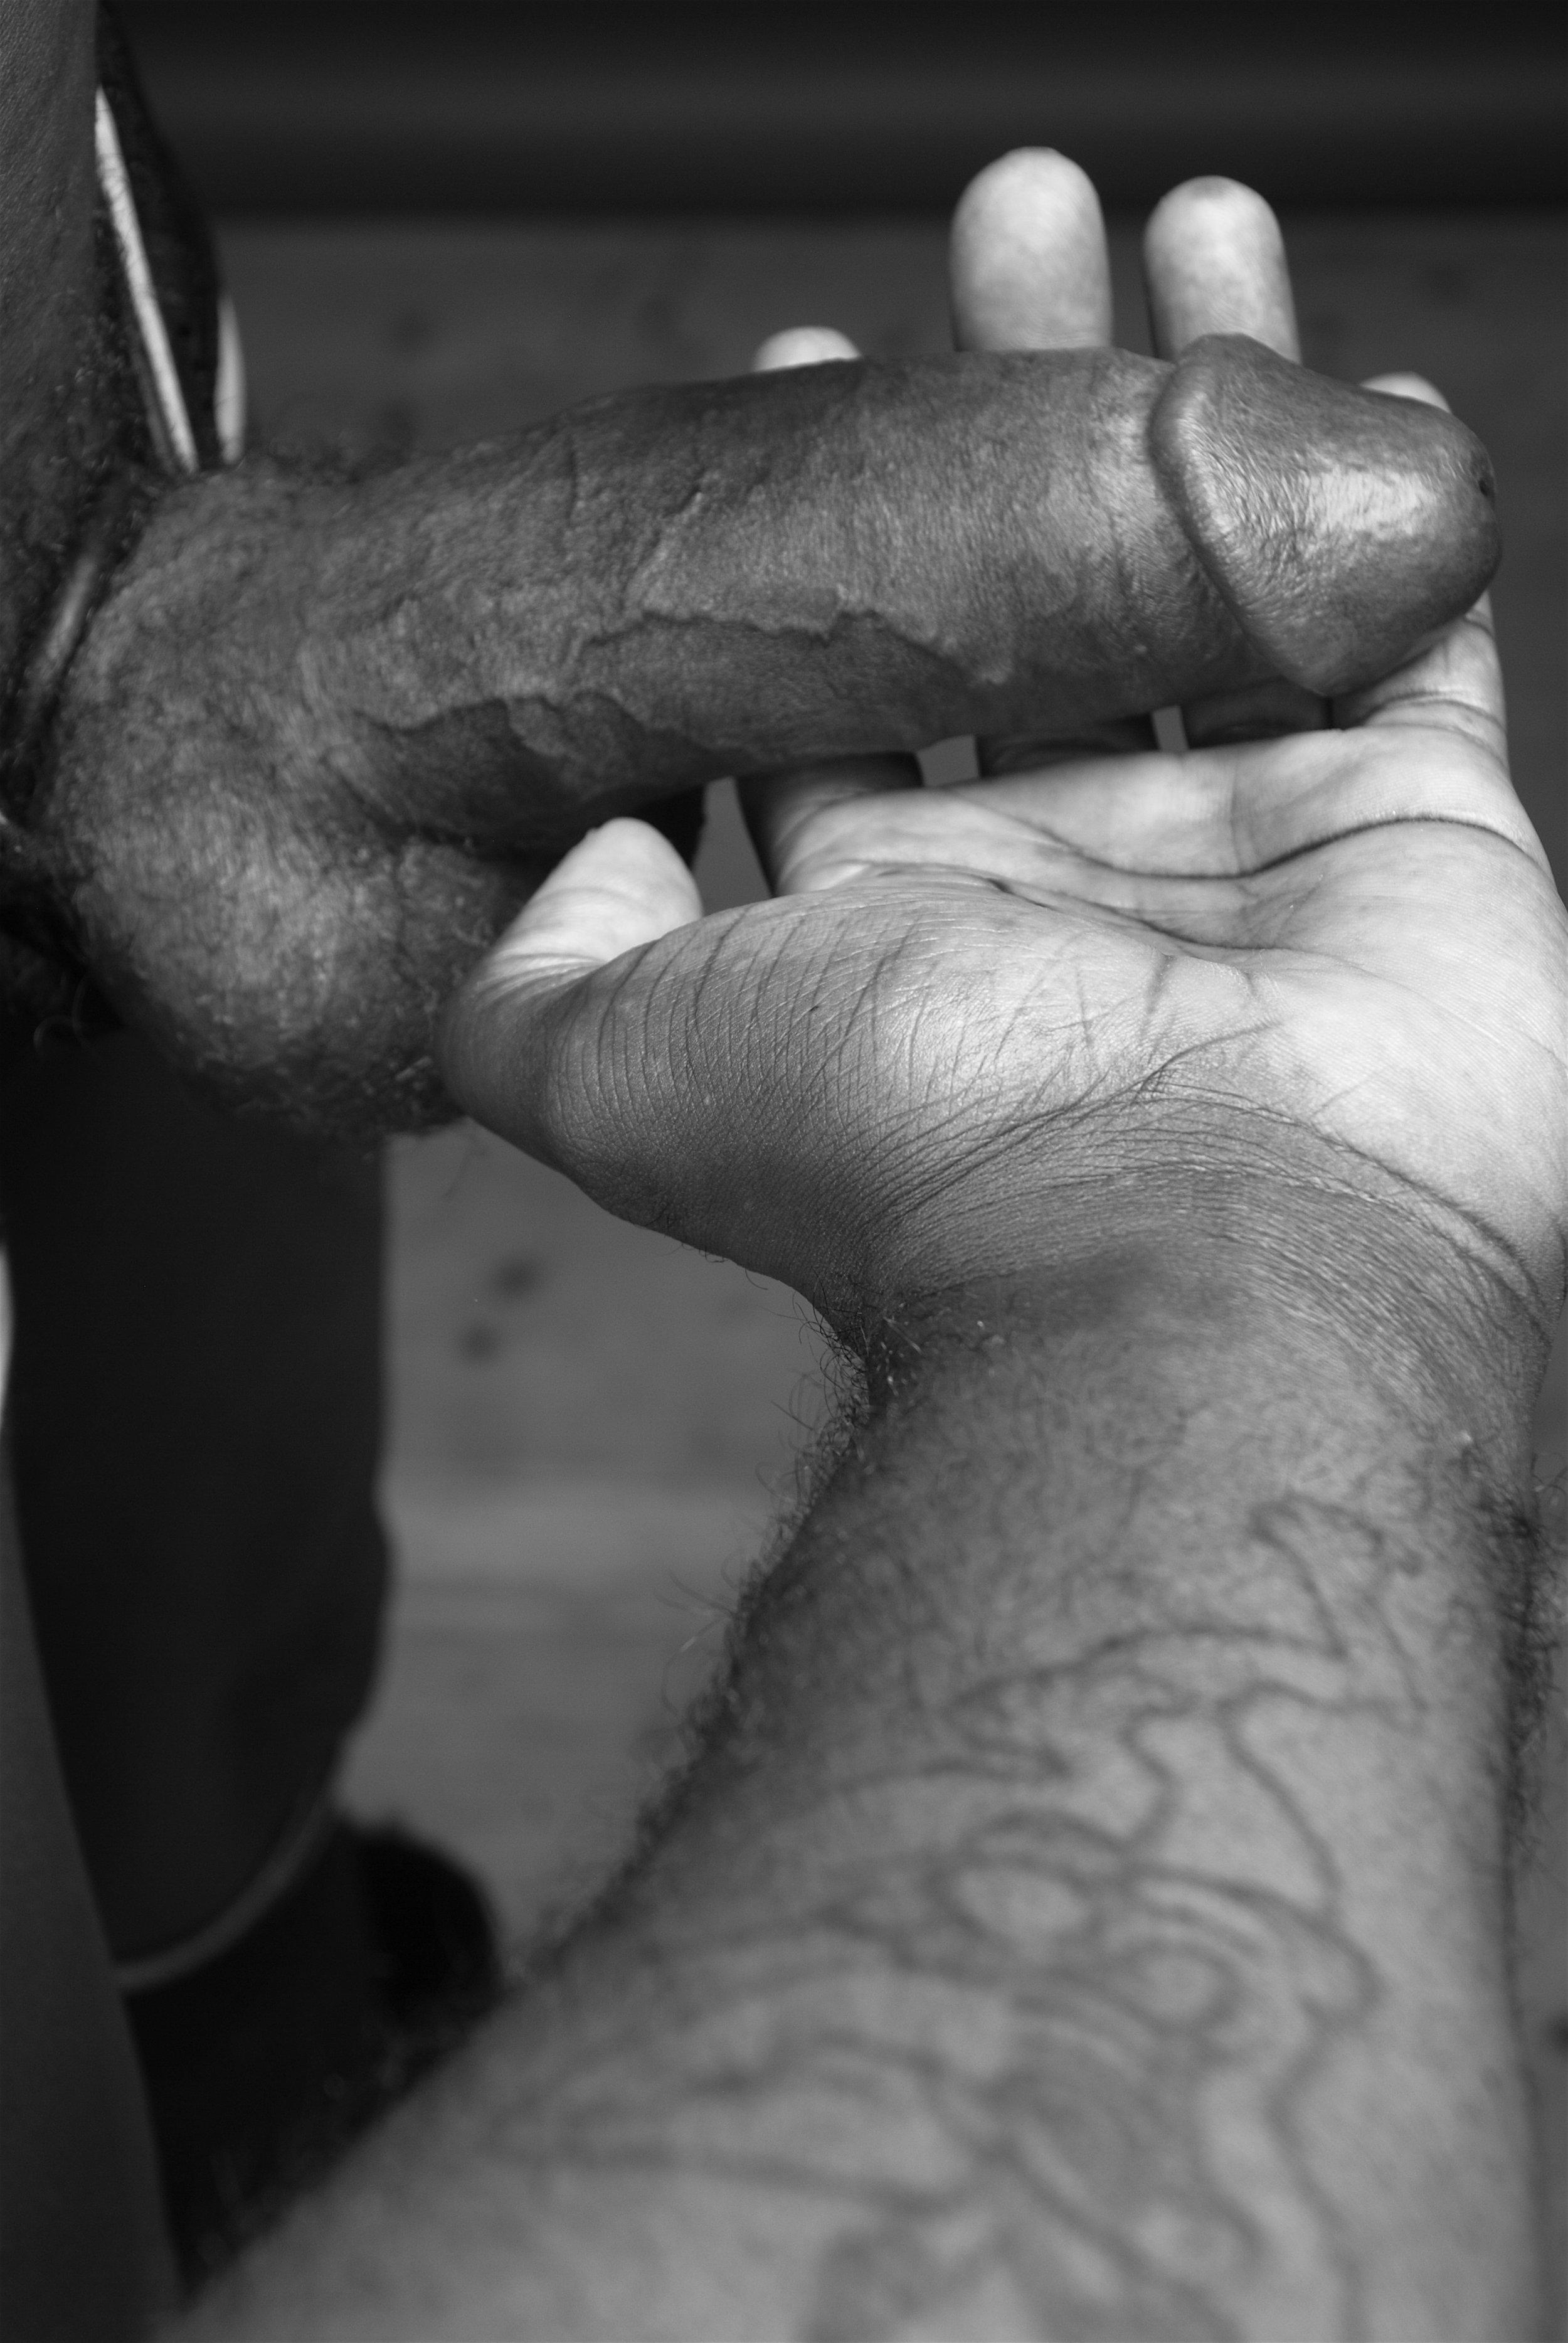 Ajamu's hand holding Dick -Image 5  2015.JPG